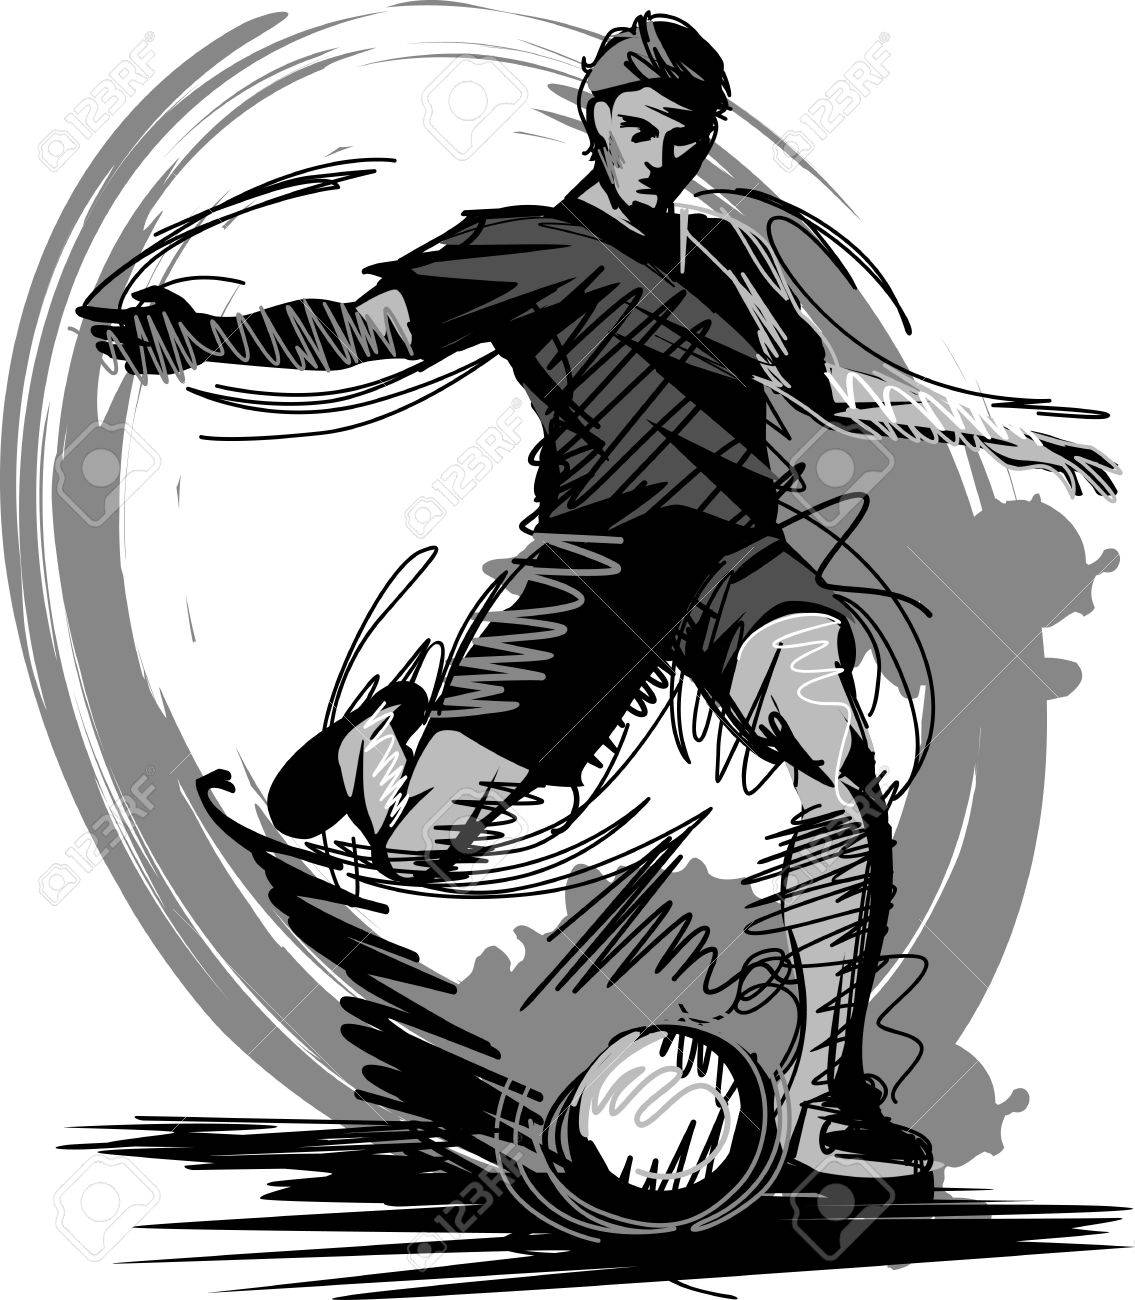 Soccer Player Kicking Ball Vector Illustration Stock Vector - 10801922